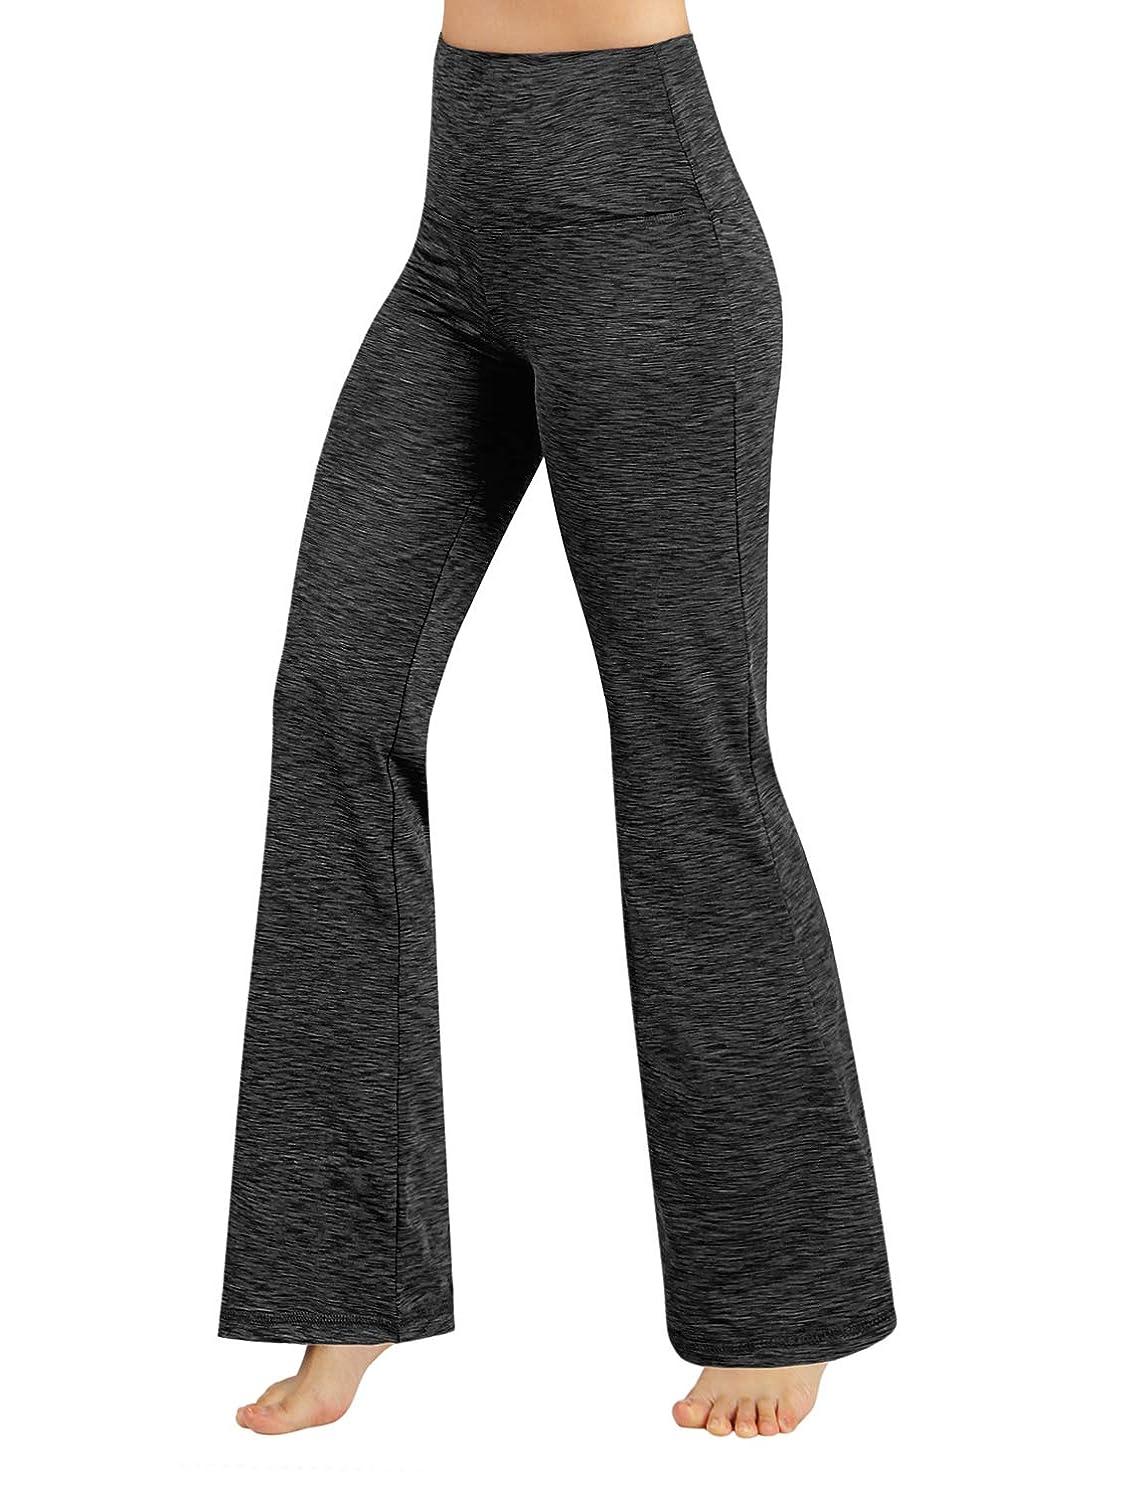 ODODOS Power Flex Boot-Cut Yoga Pants Tummy Control Workout Non See-Through Bootleg Yoga Pants